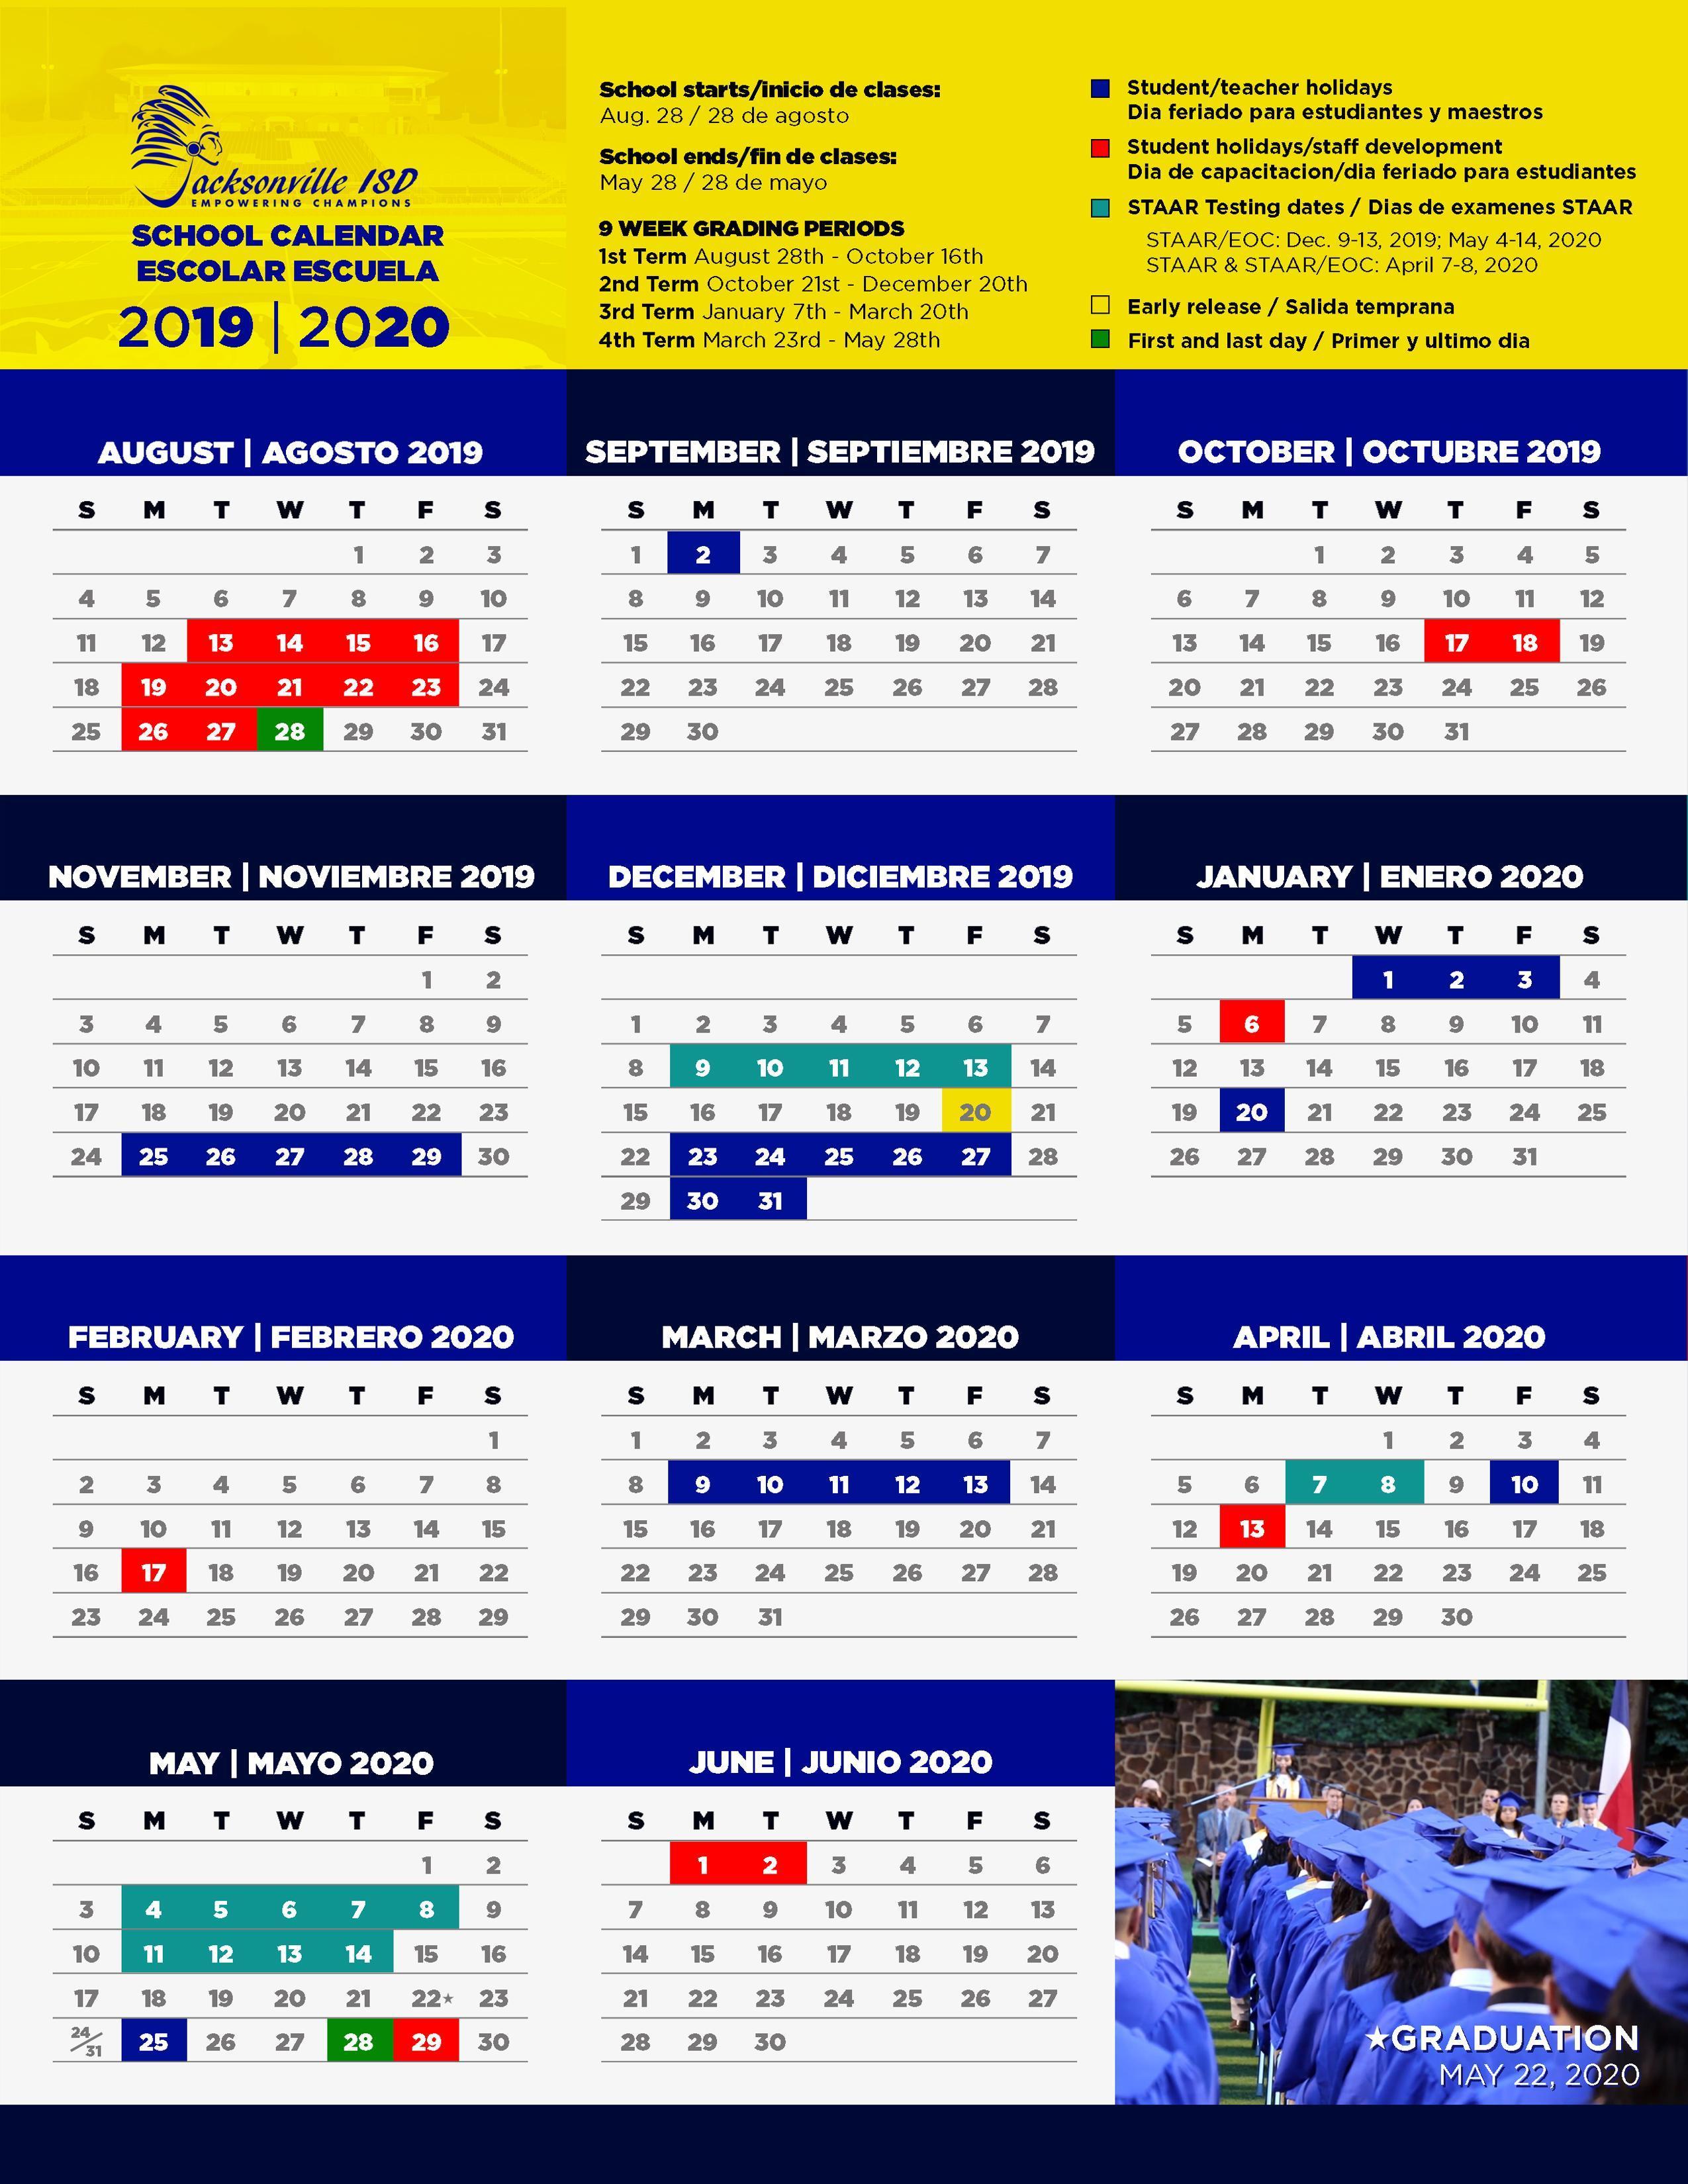 picture of annual calendar